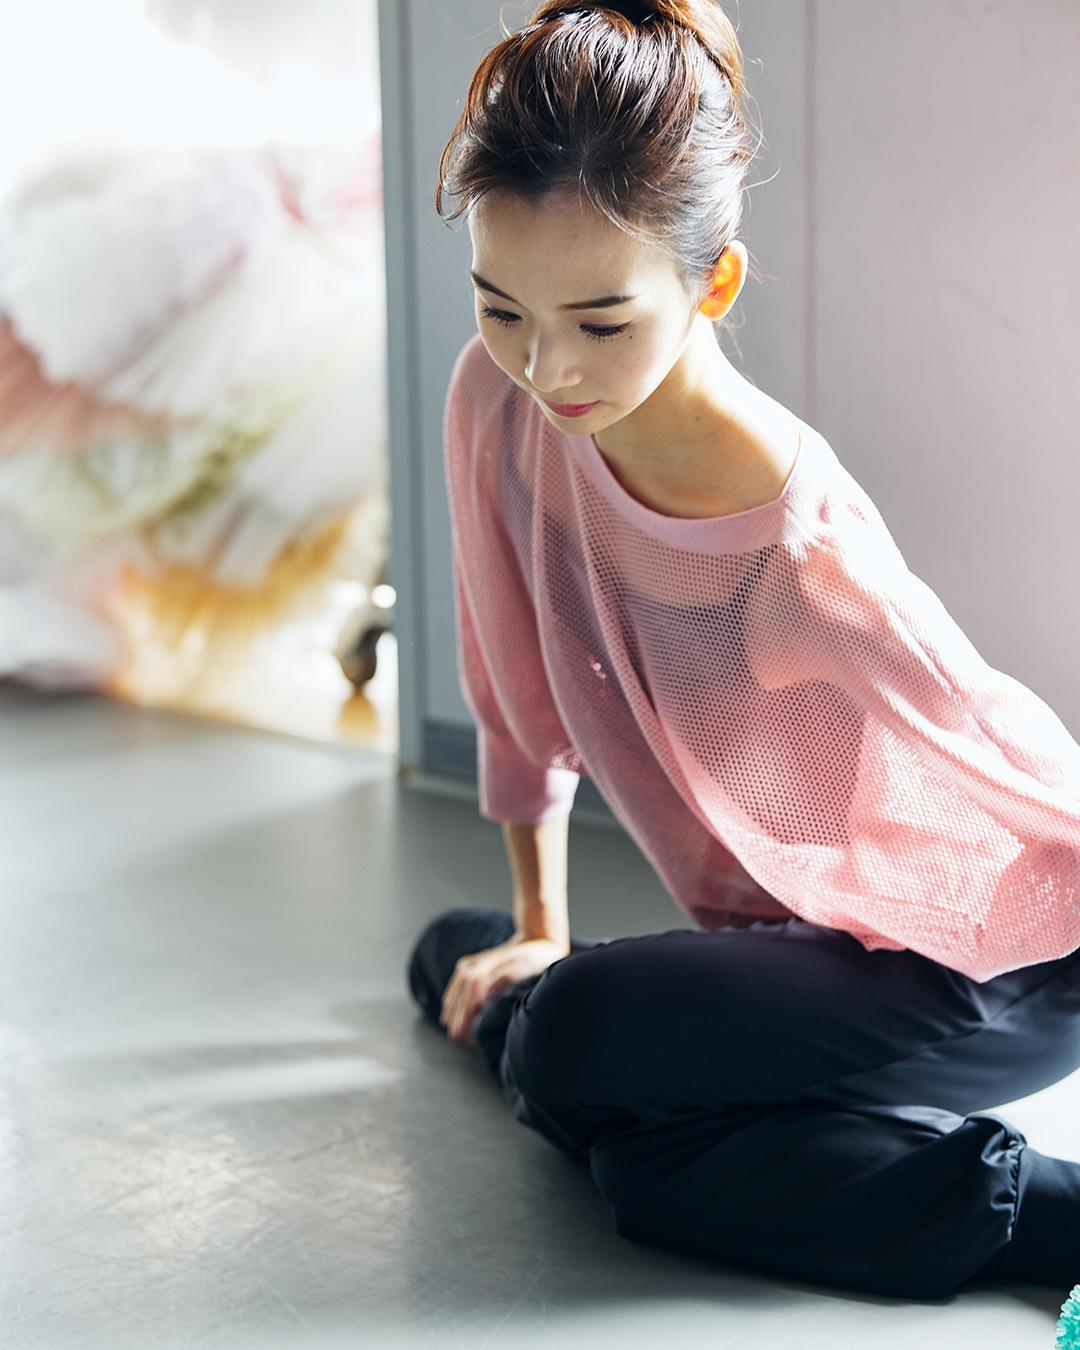 210331_ballet_warmup_8.jpg